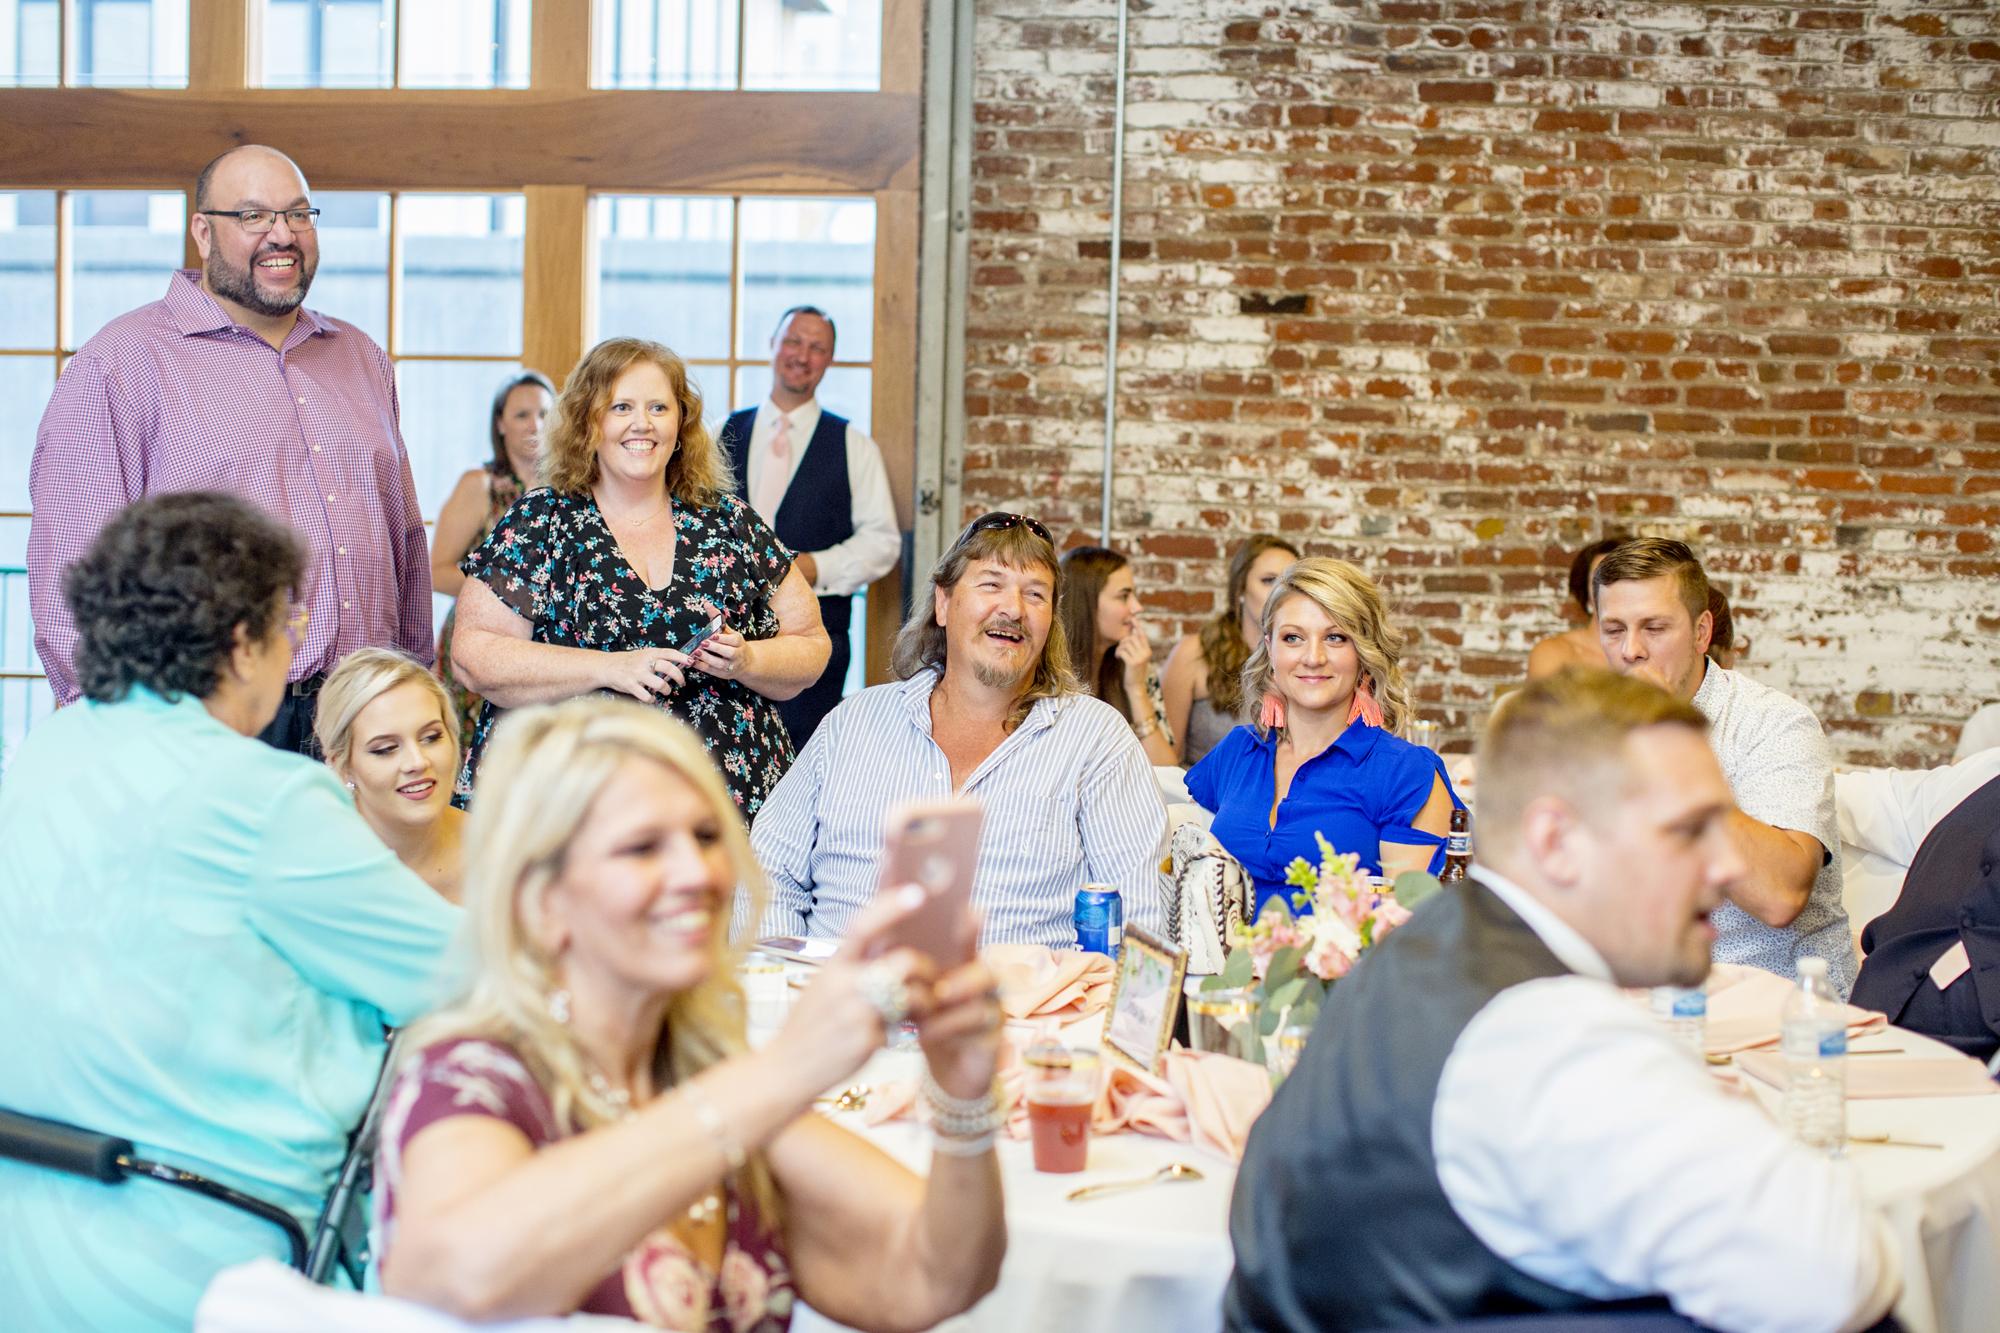 Seriously_Sabrina_Photography_Ashland_Kentucky_Train_Depot_Wedding_Parsons79.jpg